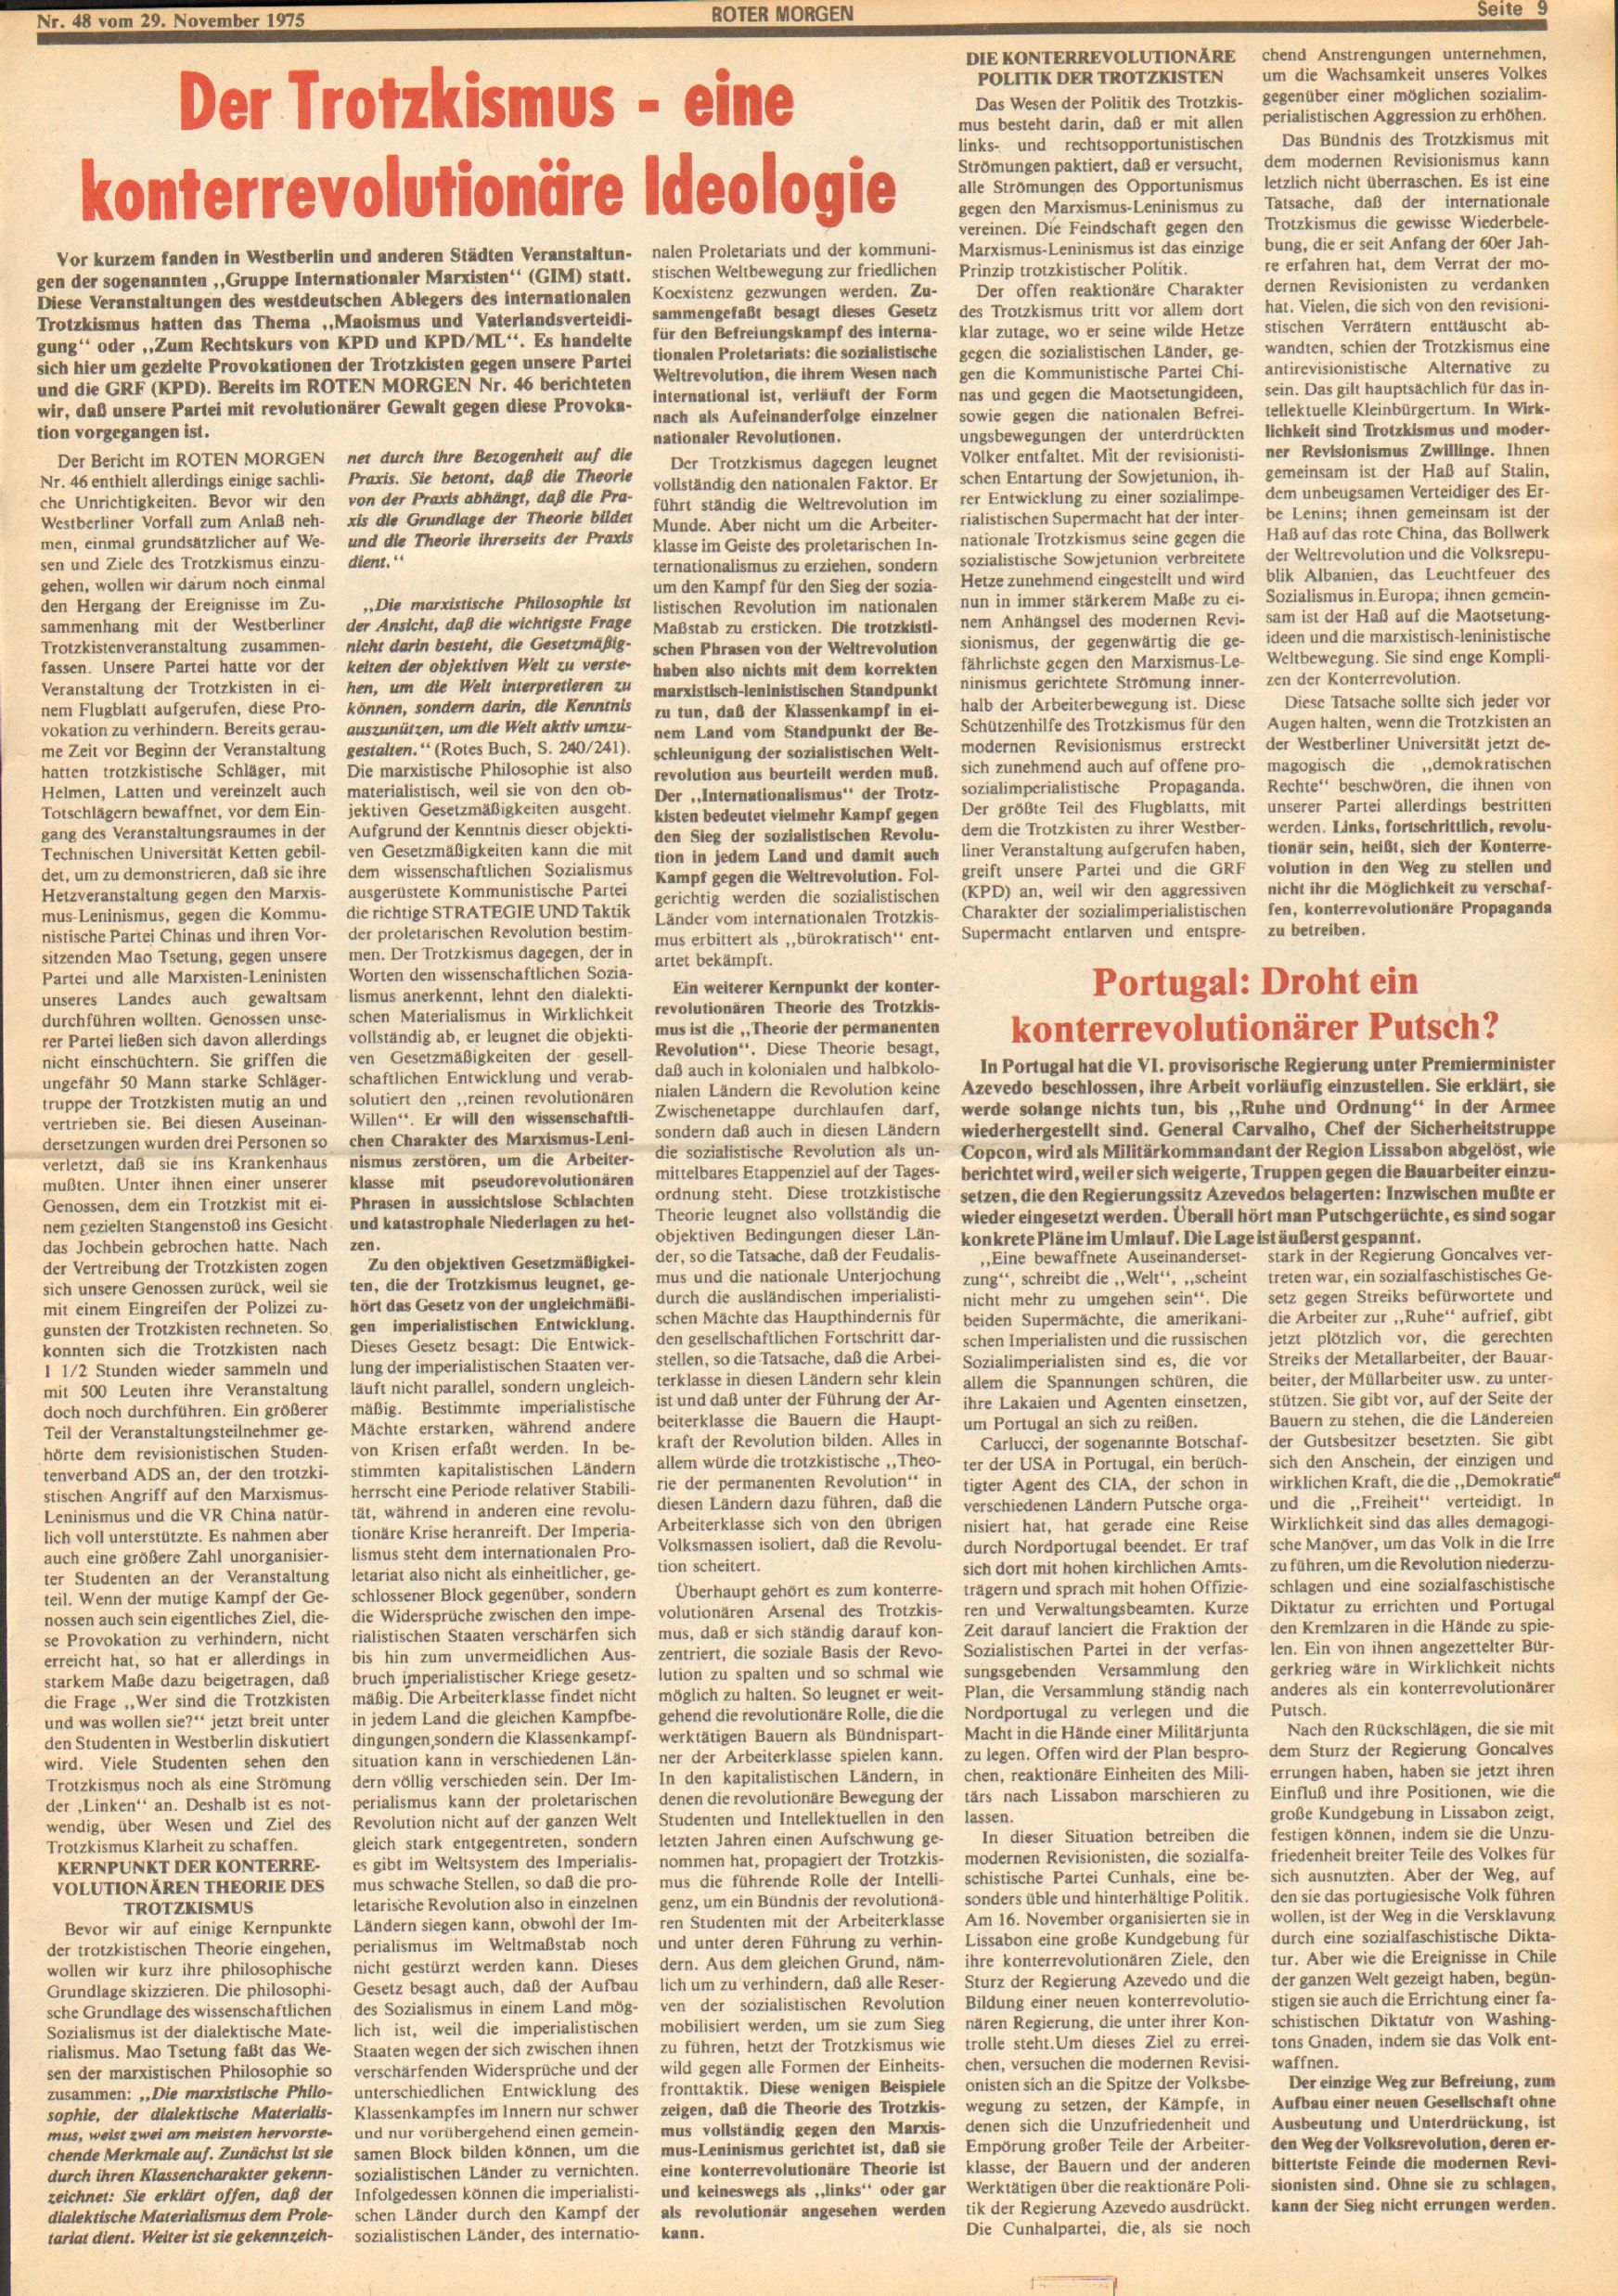 Roter Morgen, 9. Jg., 29. November 1975, Nr. 48, Seite 9